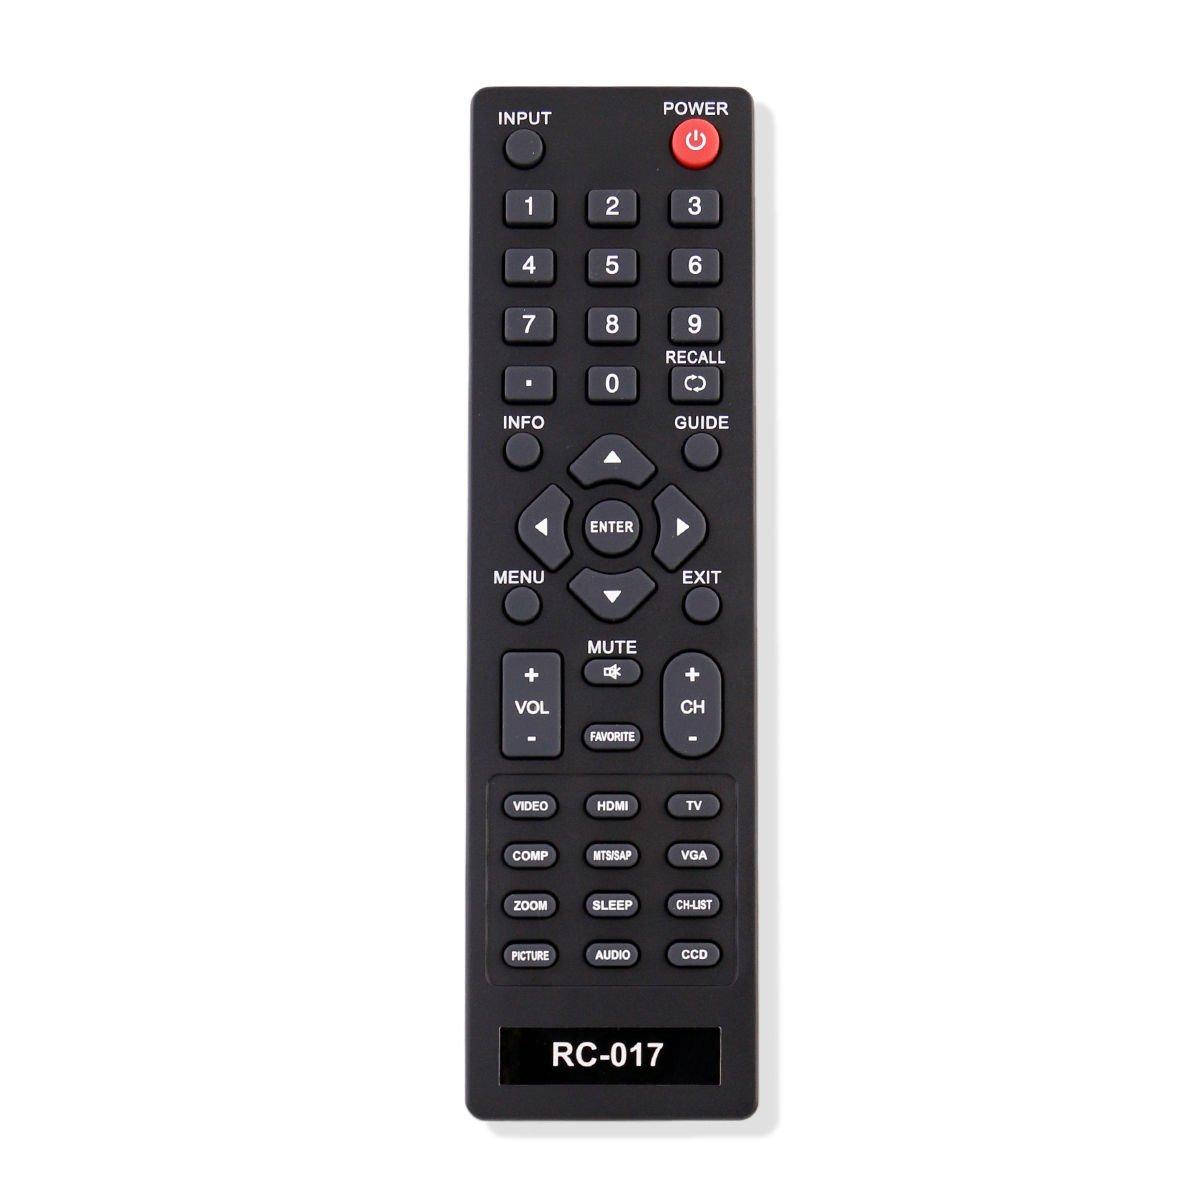 Amazon.com: Replacement LCD/LED TV Remote Control Controller For Dynex DX-26L100A13,  DX-32L100A13, DX-32L152A11, DX-40L260A12, DX-46L150A11, DX-55L150A1Z ...